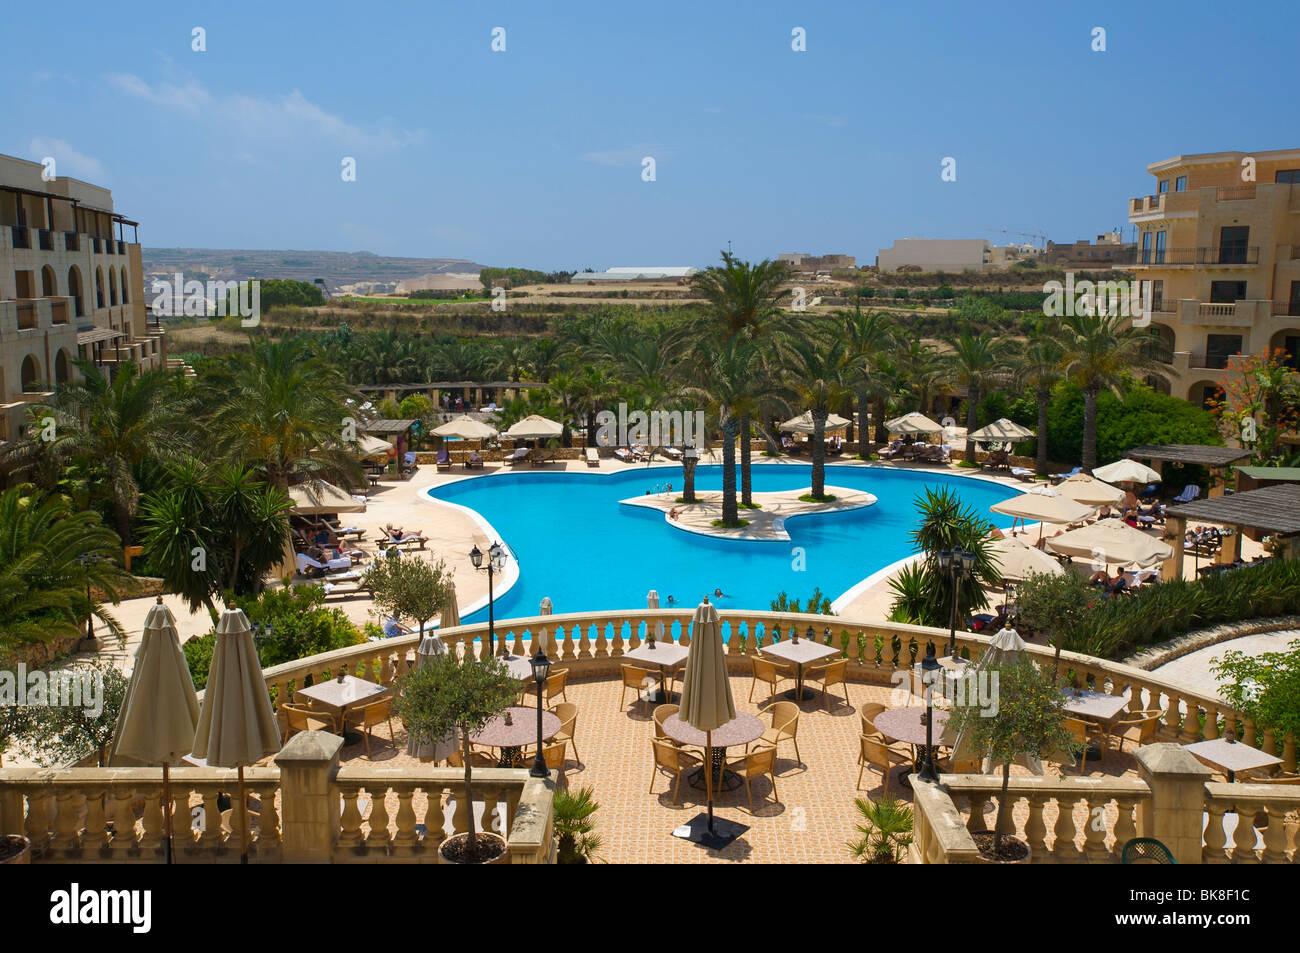 Kempinski Hotel in San Lawrenz on the island of Gozo, Malta, Europe Stock Photo